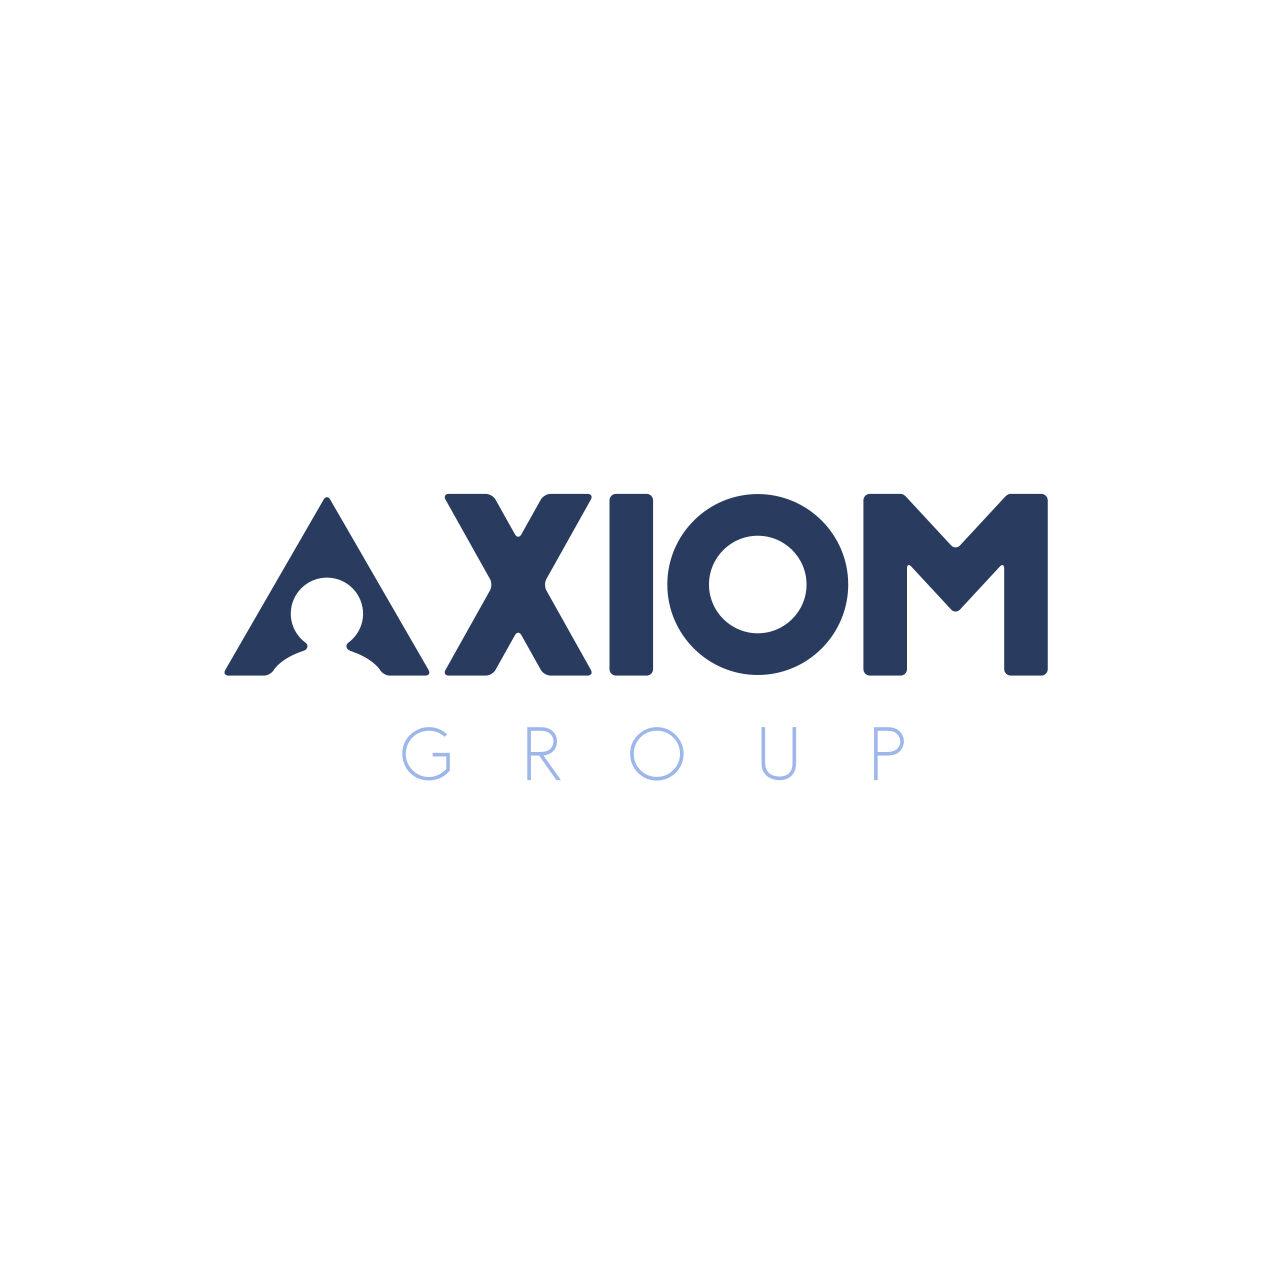 Axiom Group Partners LLC